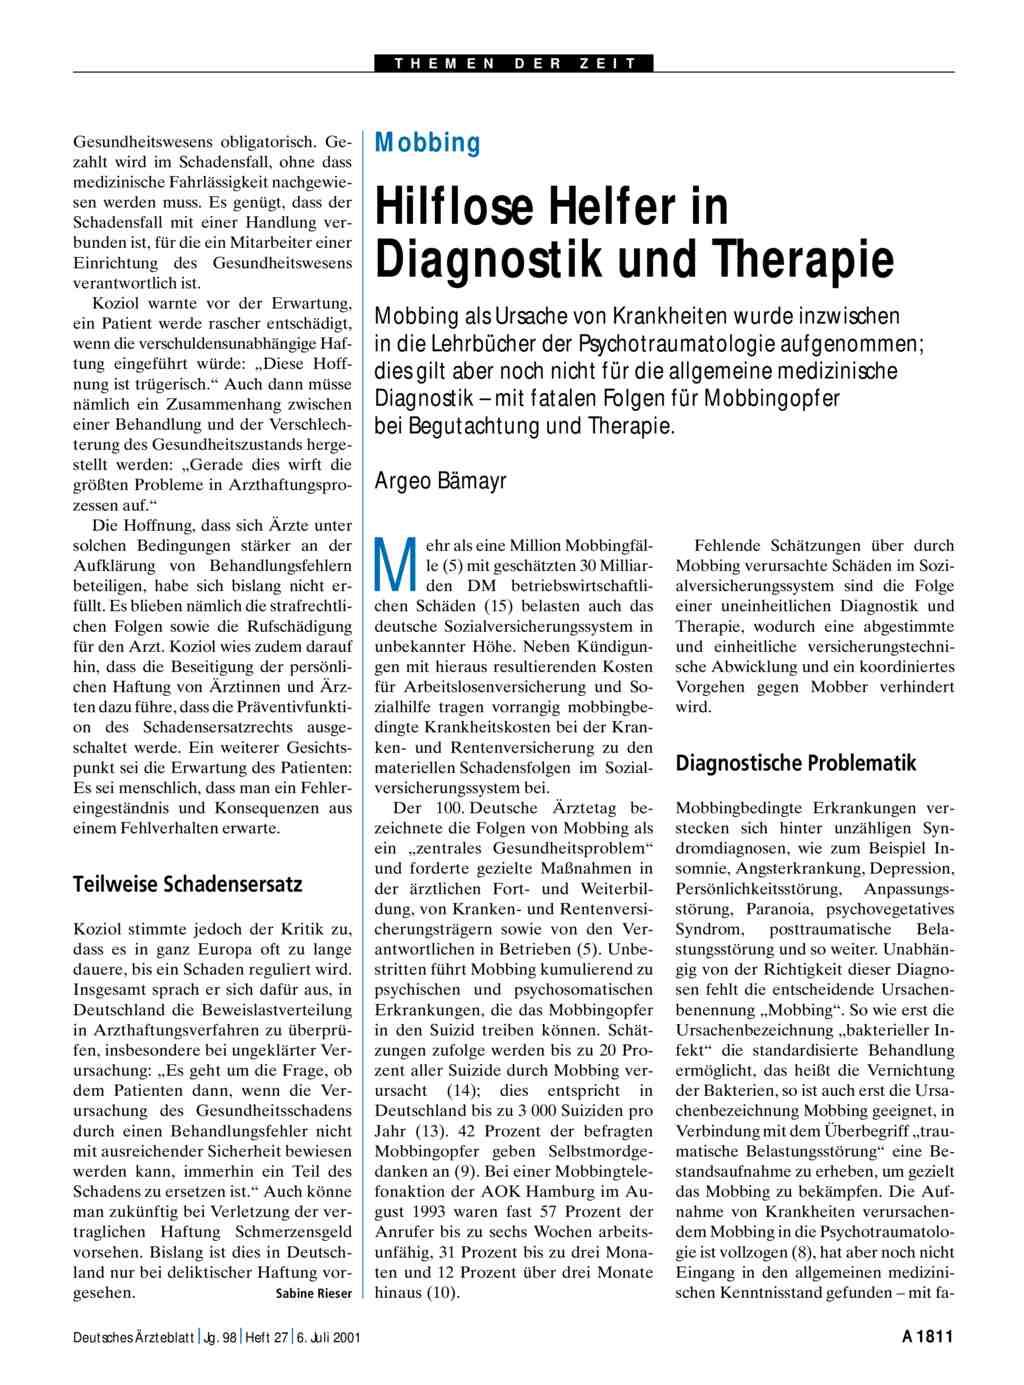 Hilflose Helfer